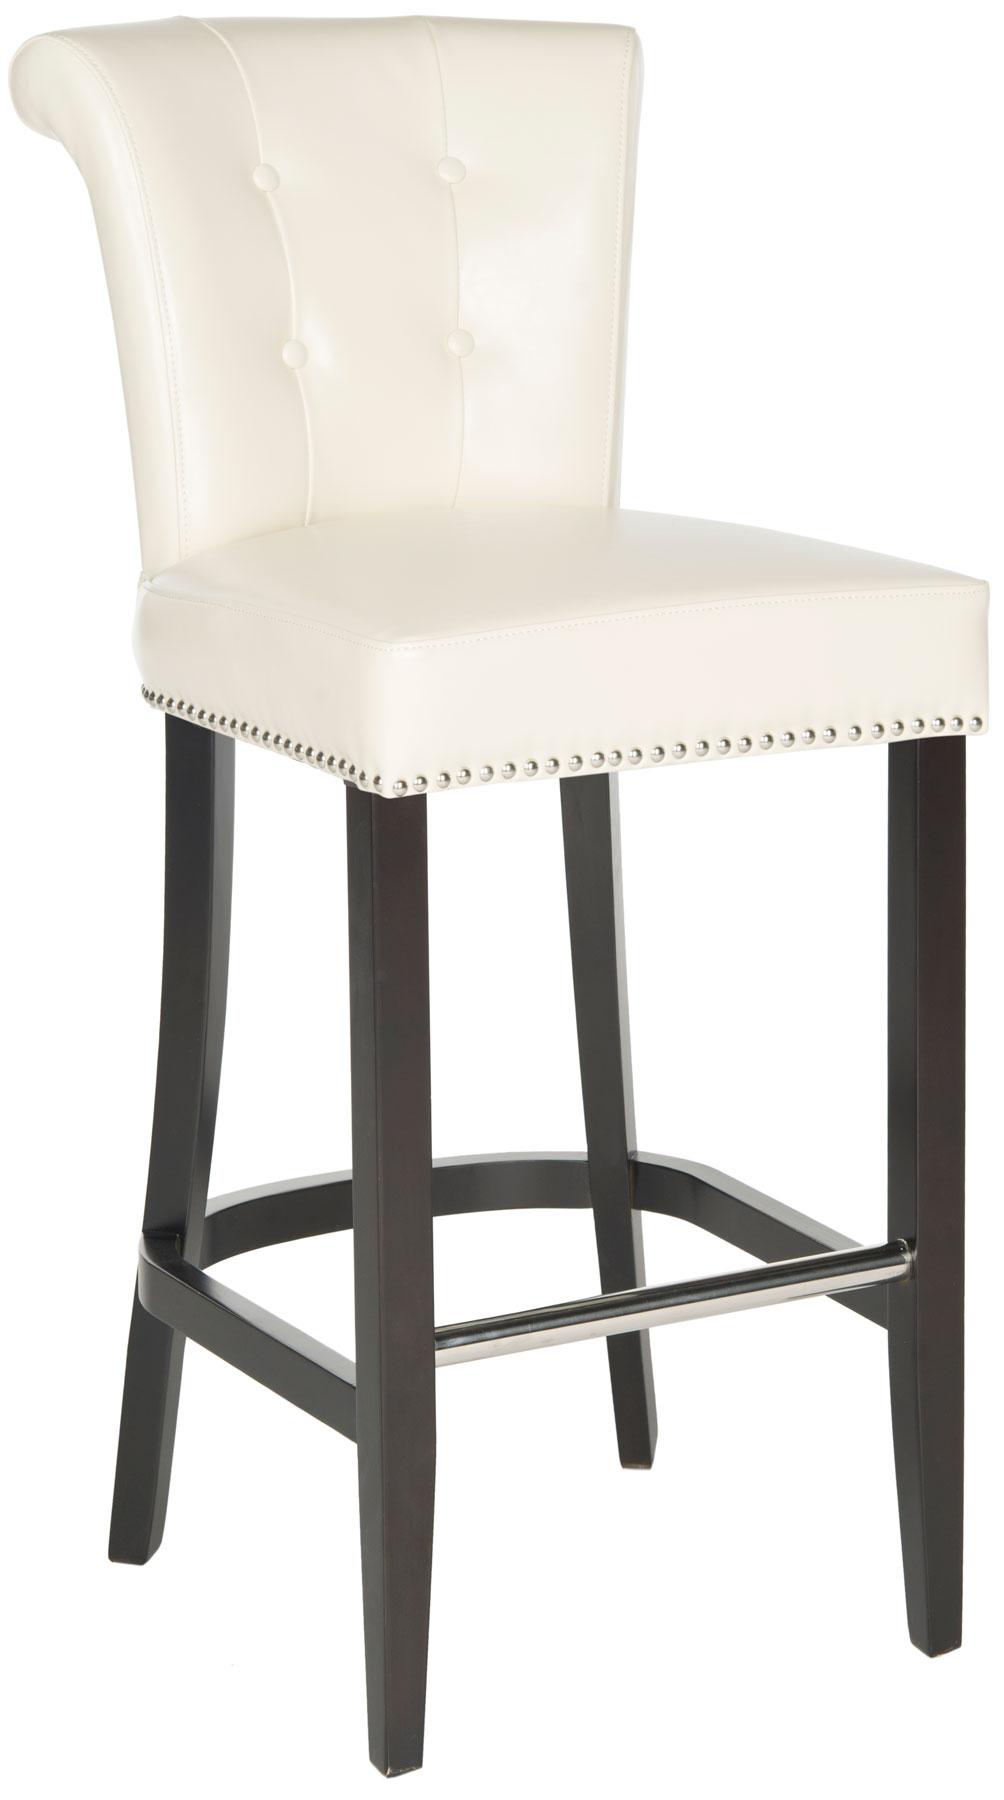 Hud8242d Bar Stools Furniture By Safavieh